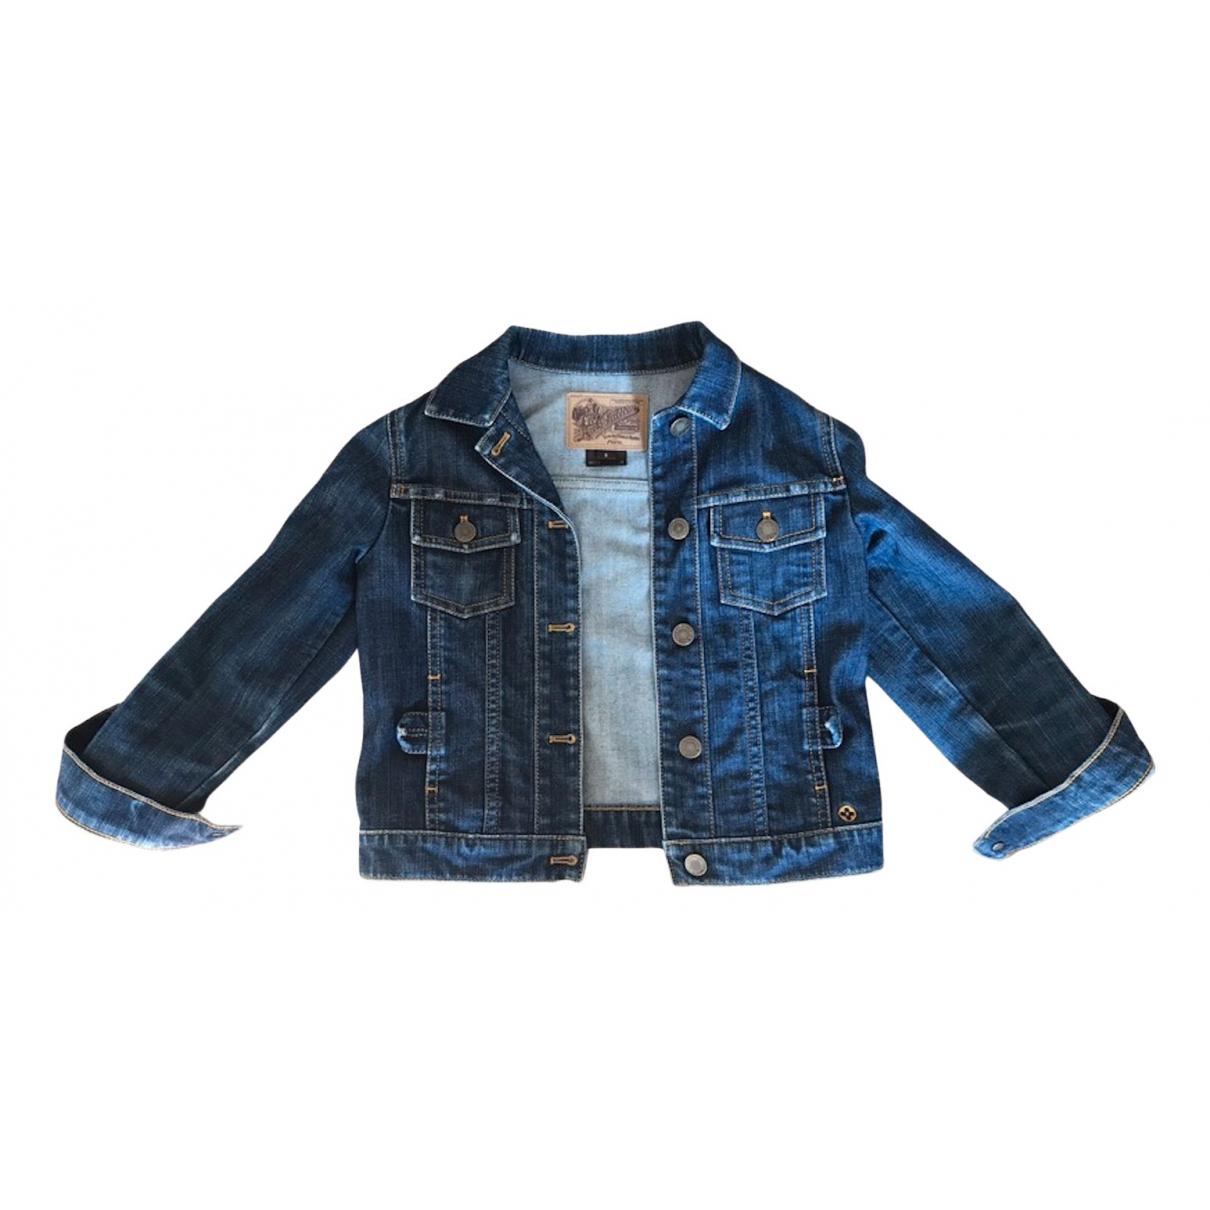 Louis Vuitton \N Jacke, Maentel in  Blau Denim - Jeans